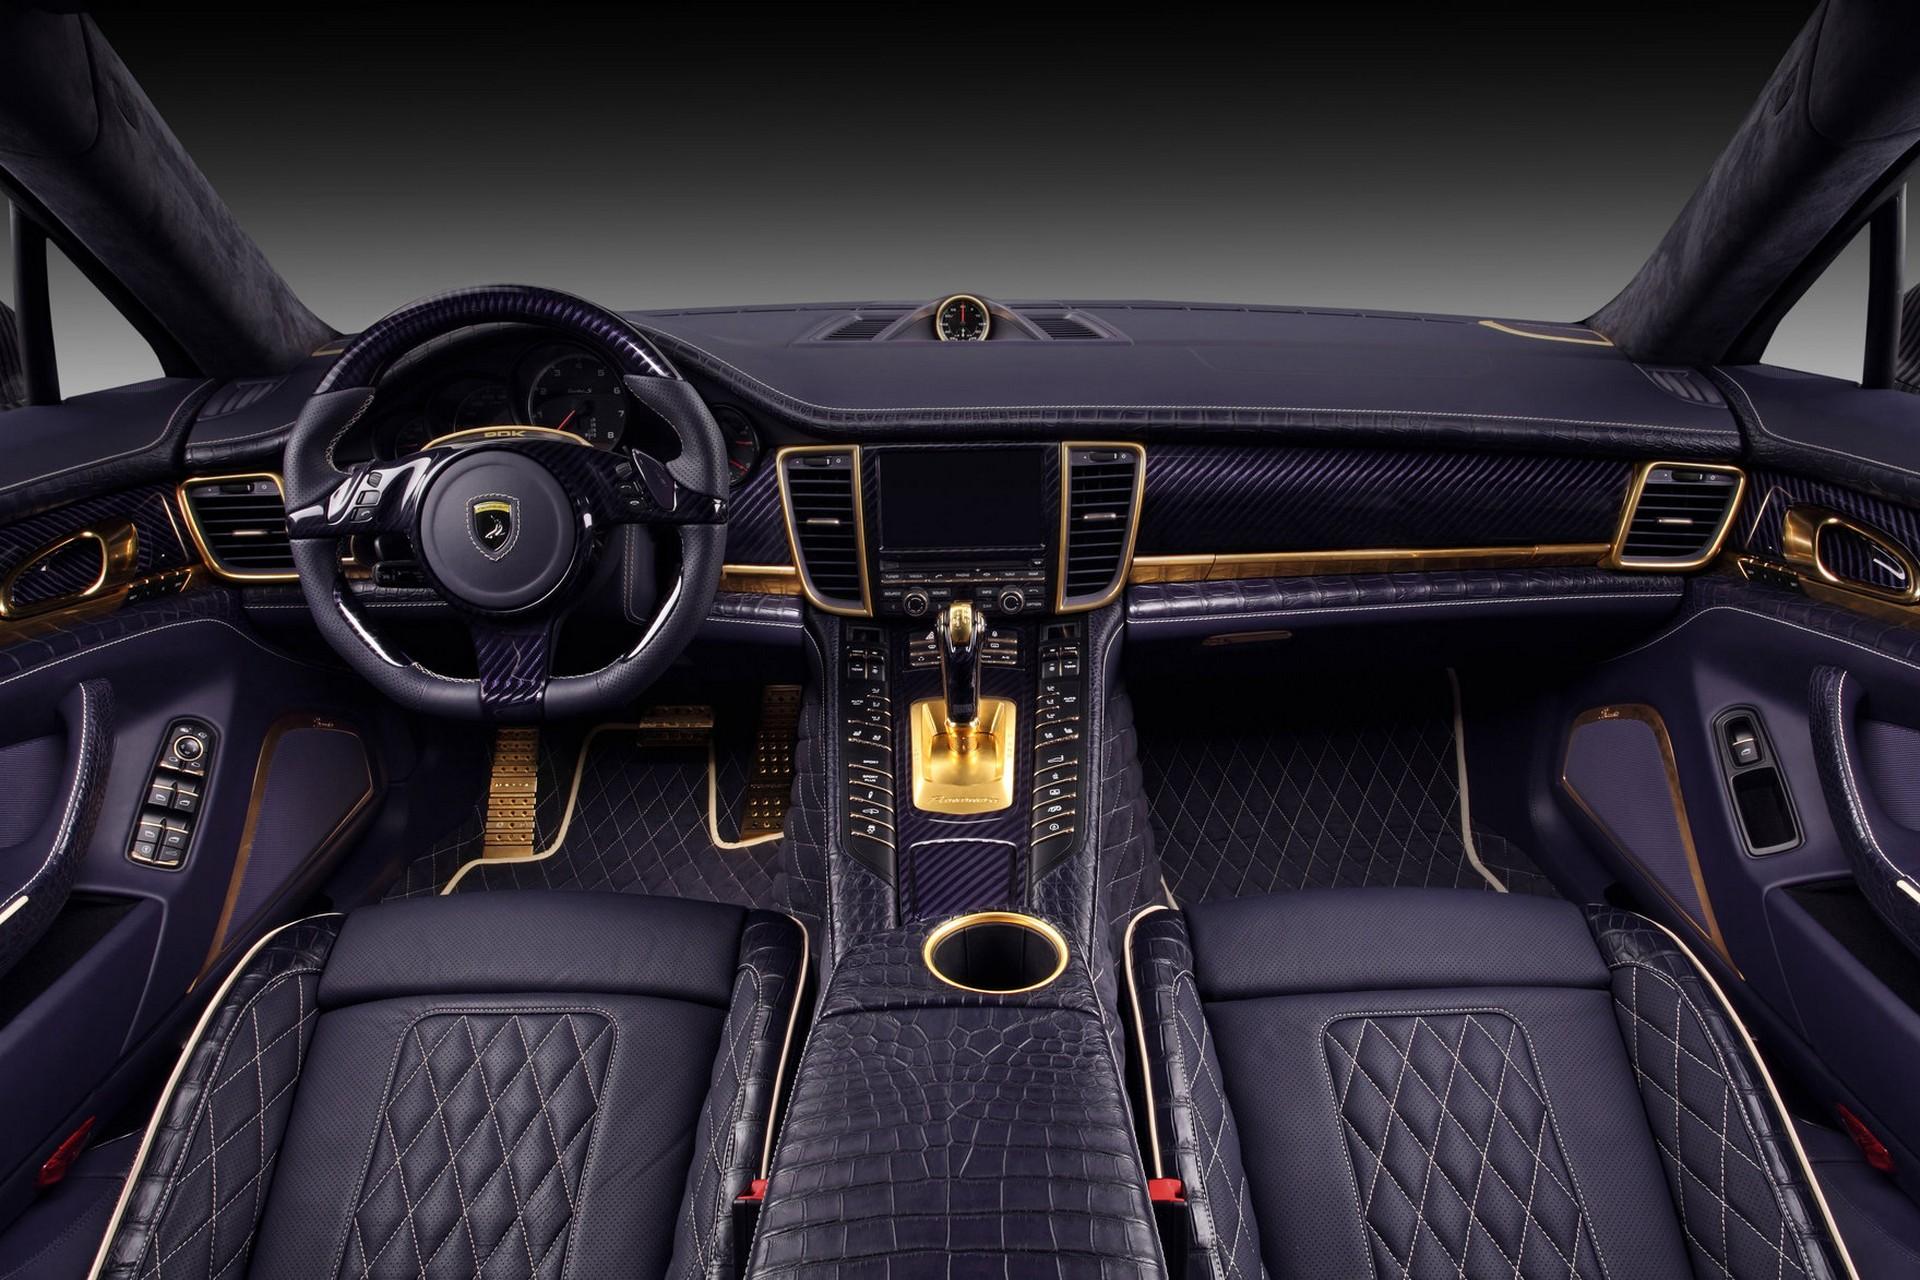 2014 porsche panamera interior car tuning - Unique Approach